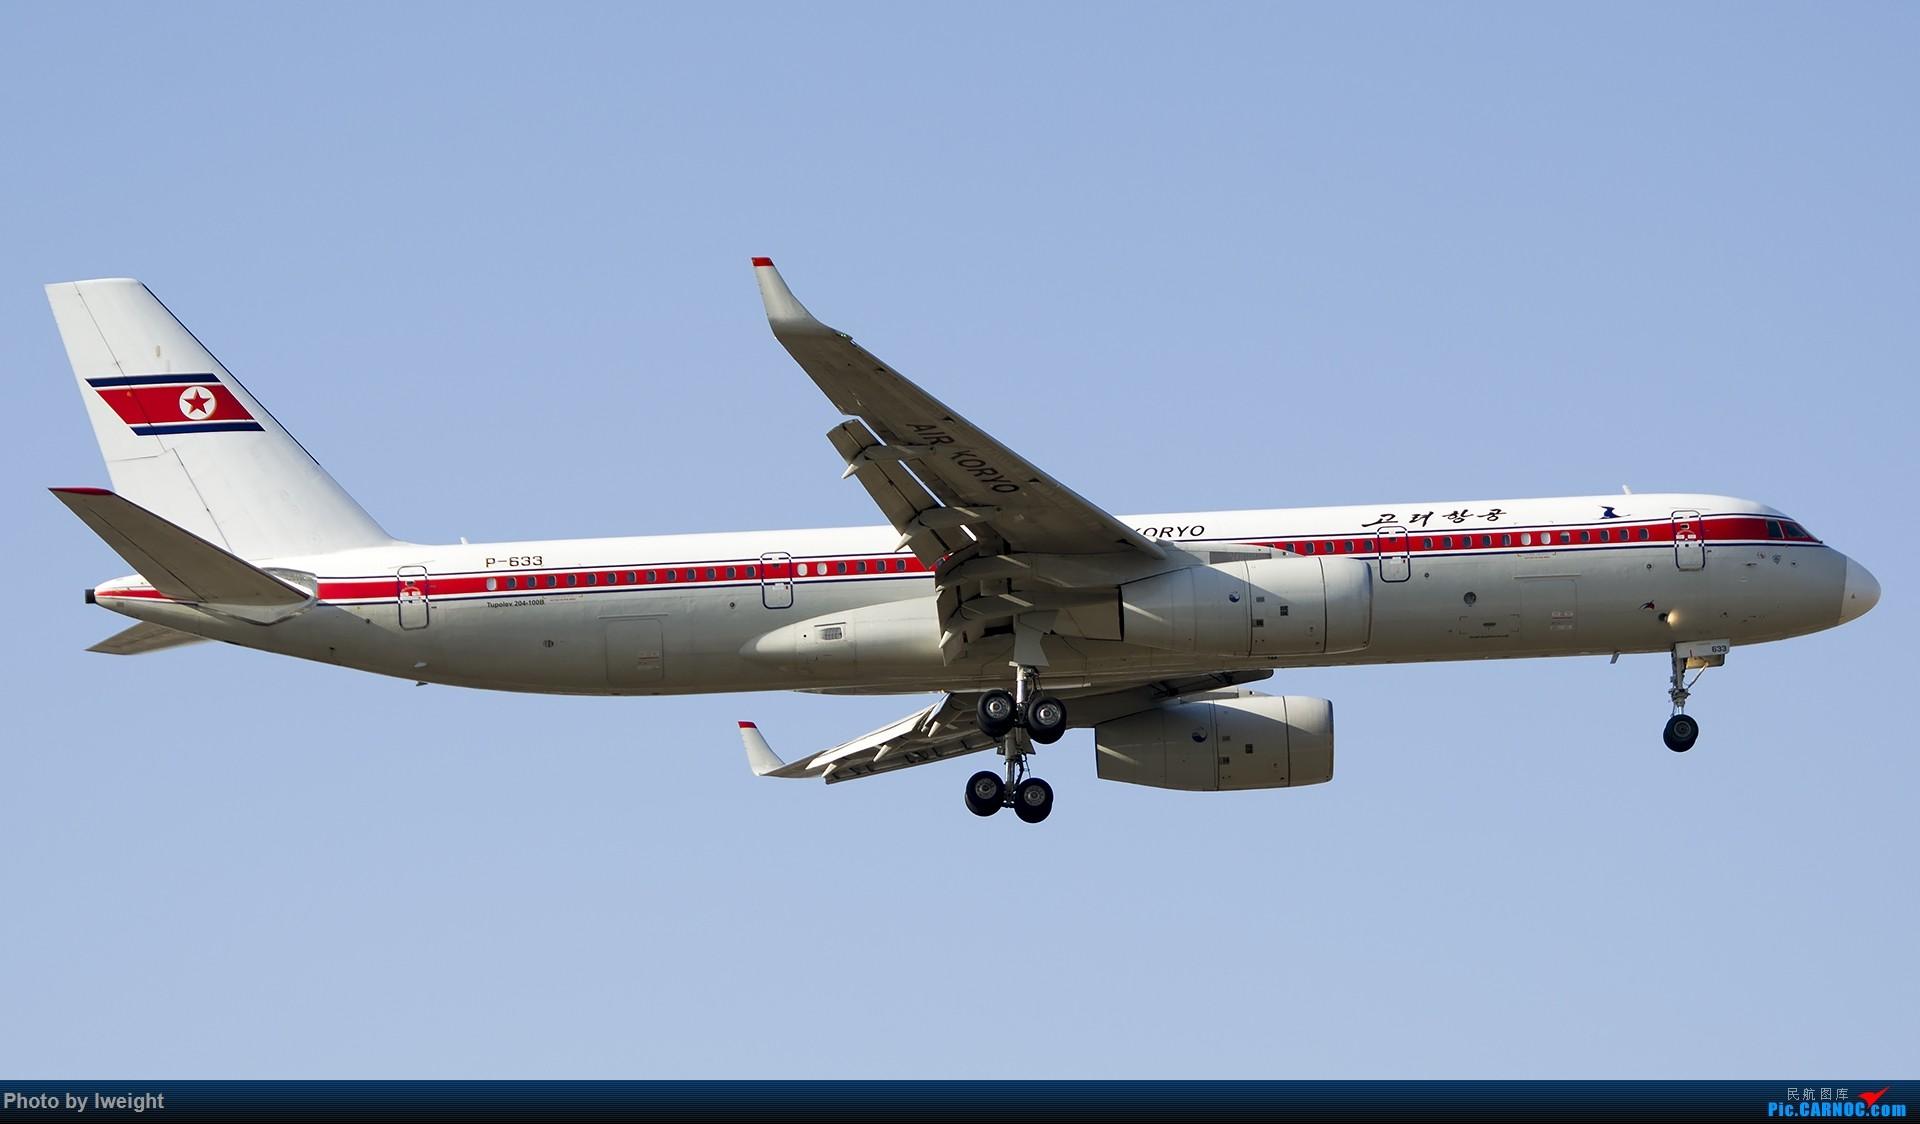 Re:[原创]2014-12-02 ZBAA随拍 TUPOLEV TU-204-100 P-633 中国北京首都国际机场